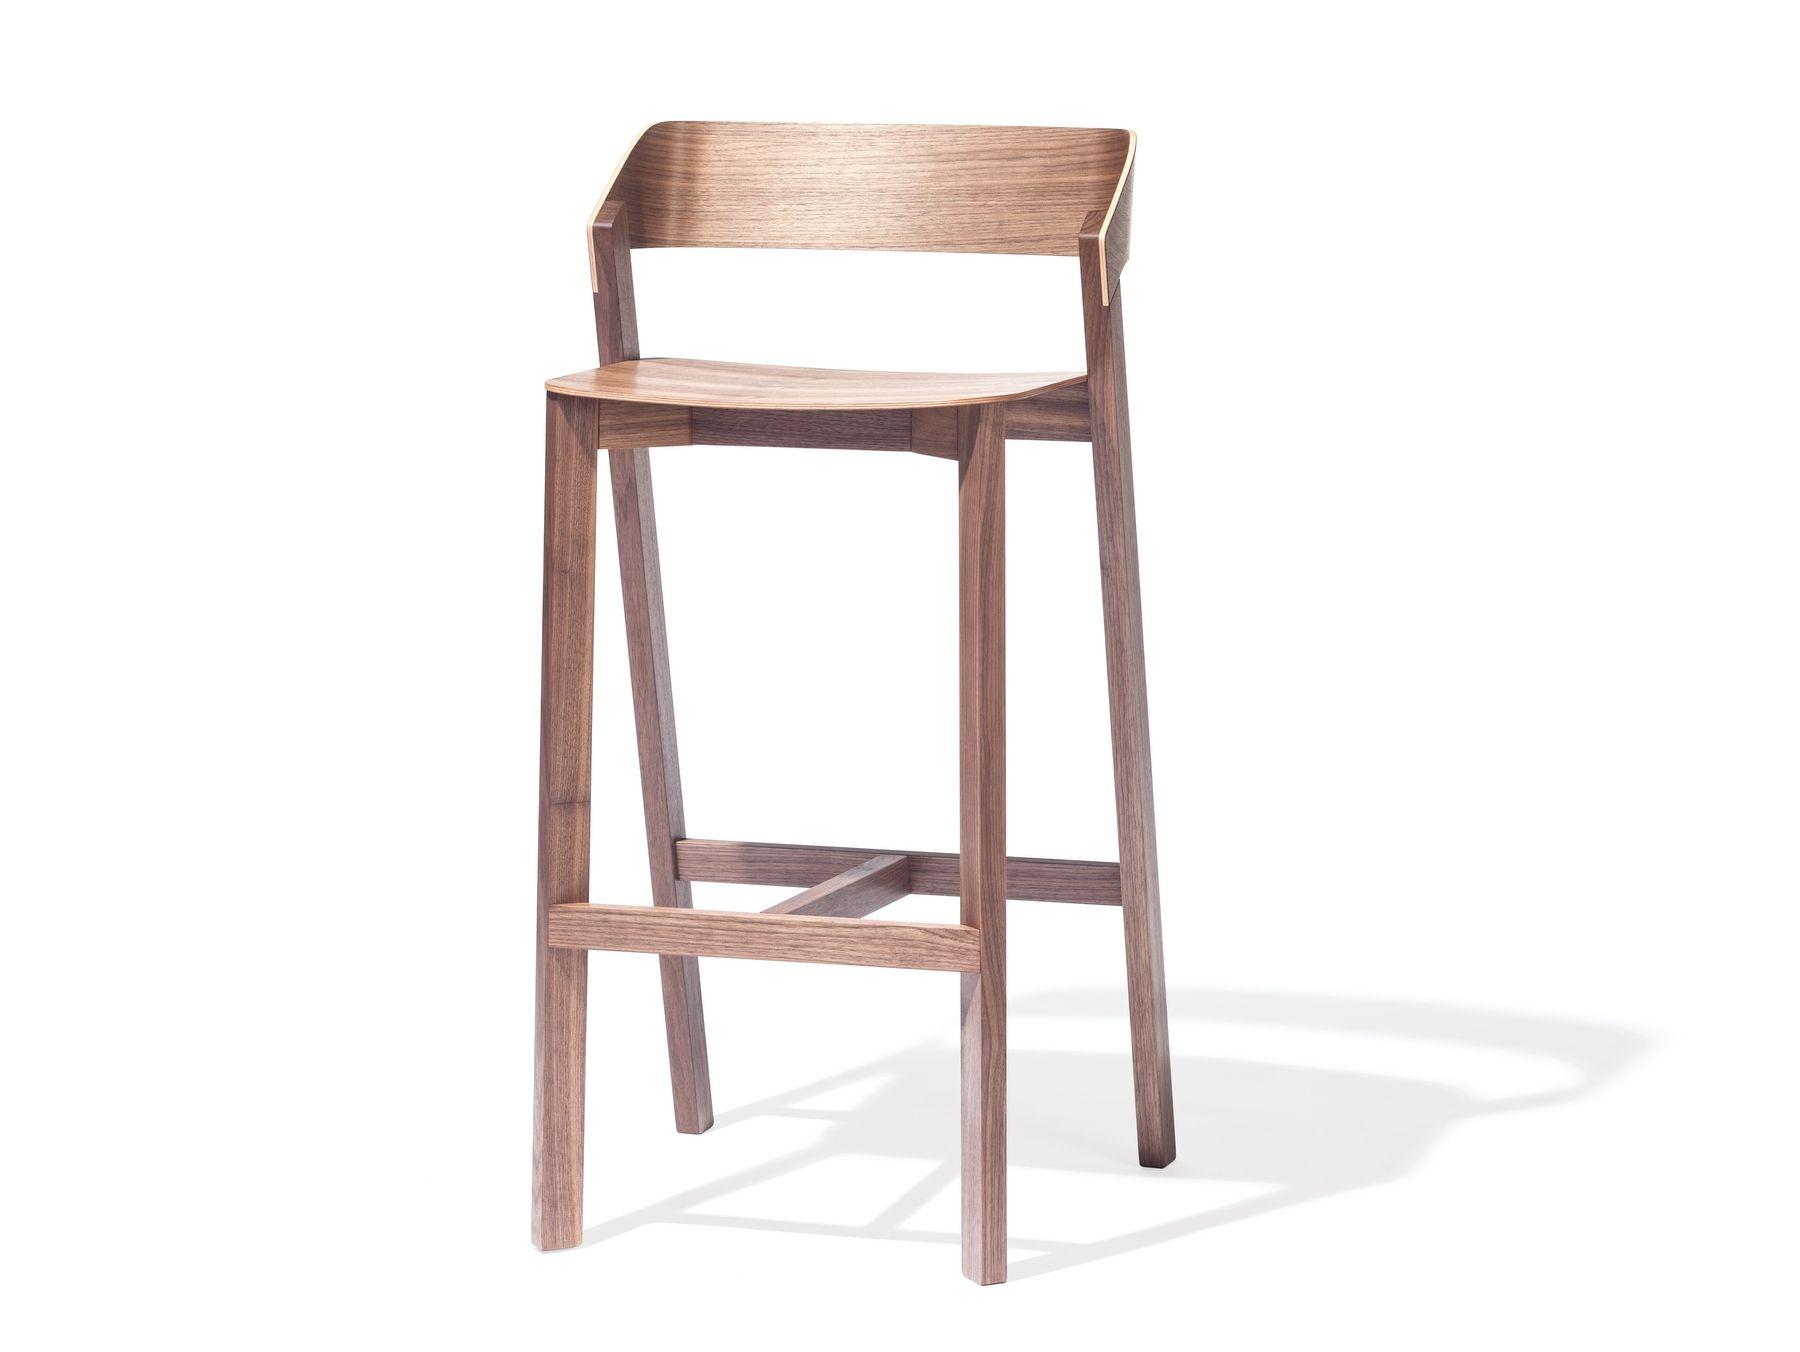 Merano sedia alta by ton design alexander gufler for Sedia alta